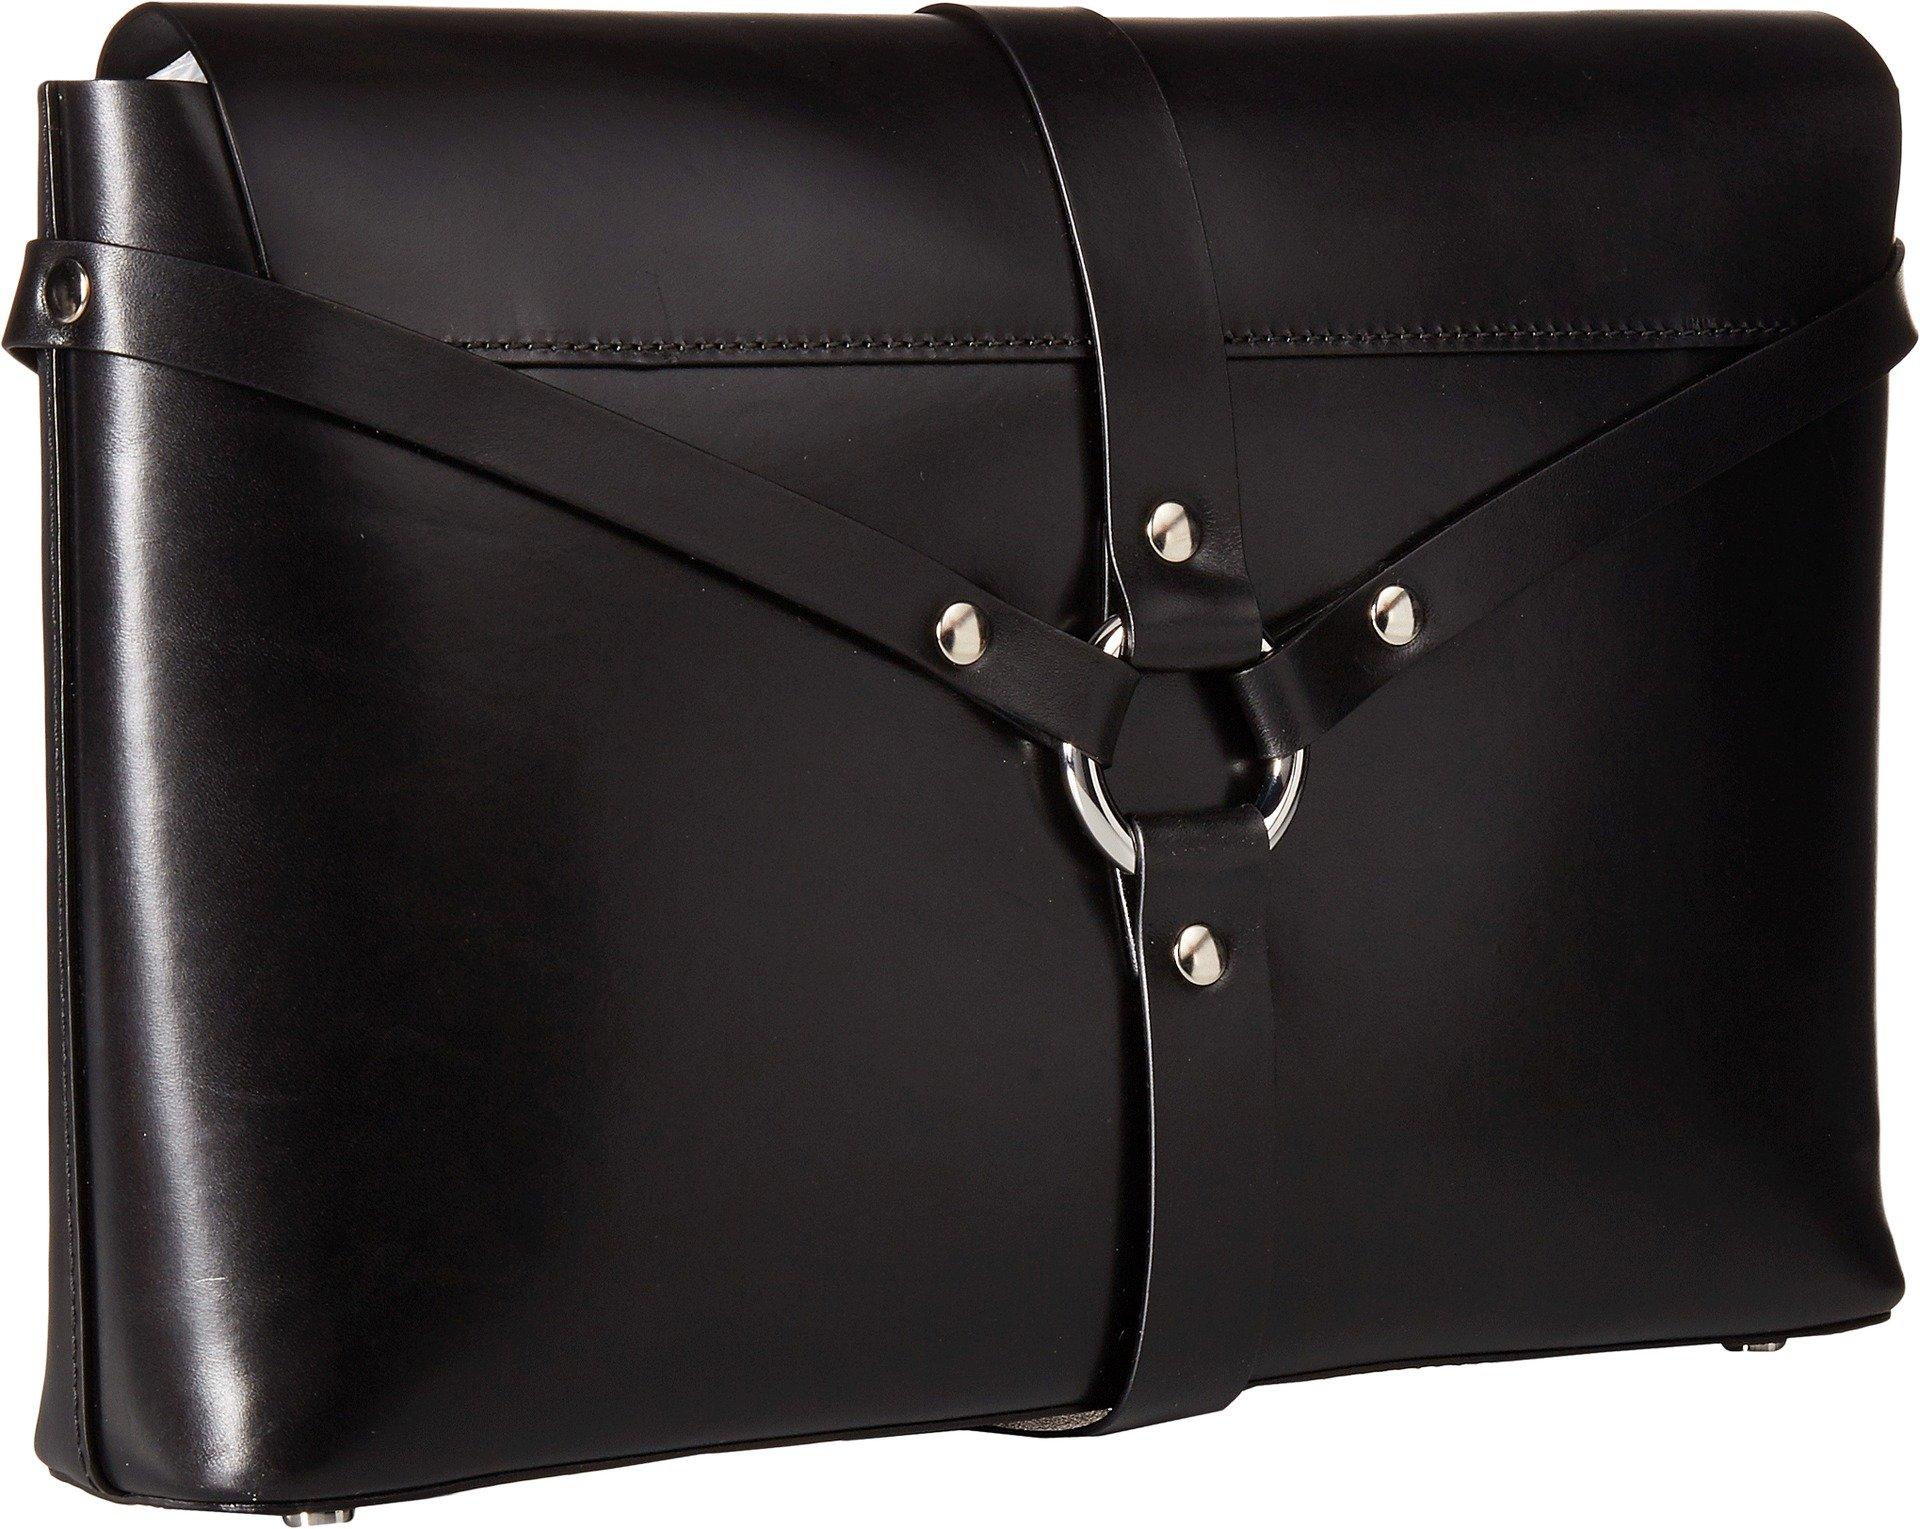 Vivienne Westwood Women's Betty Clutch Black One Size by Vivienne Westwood (Image #2)